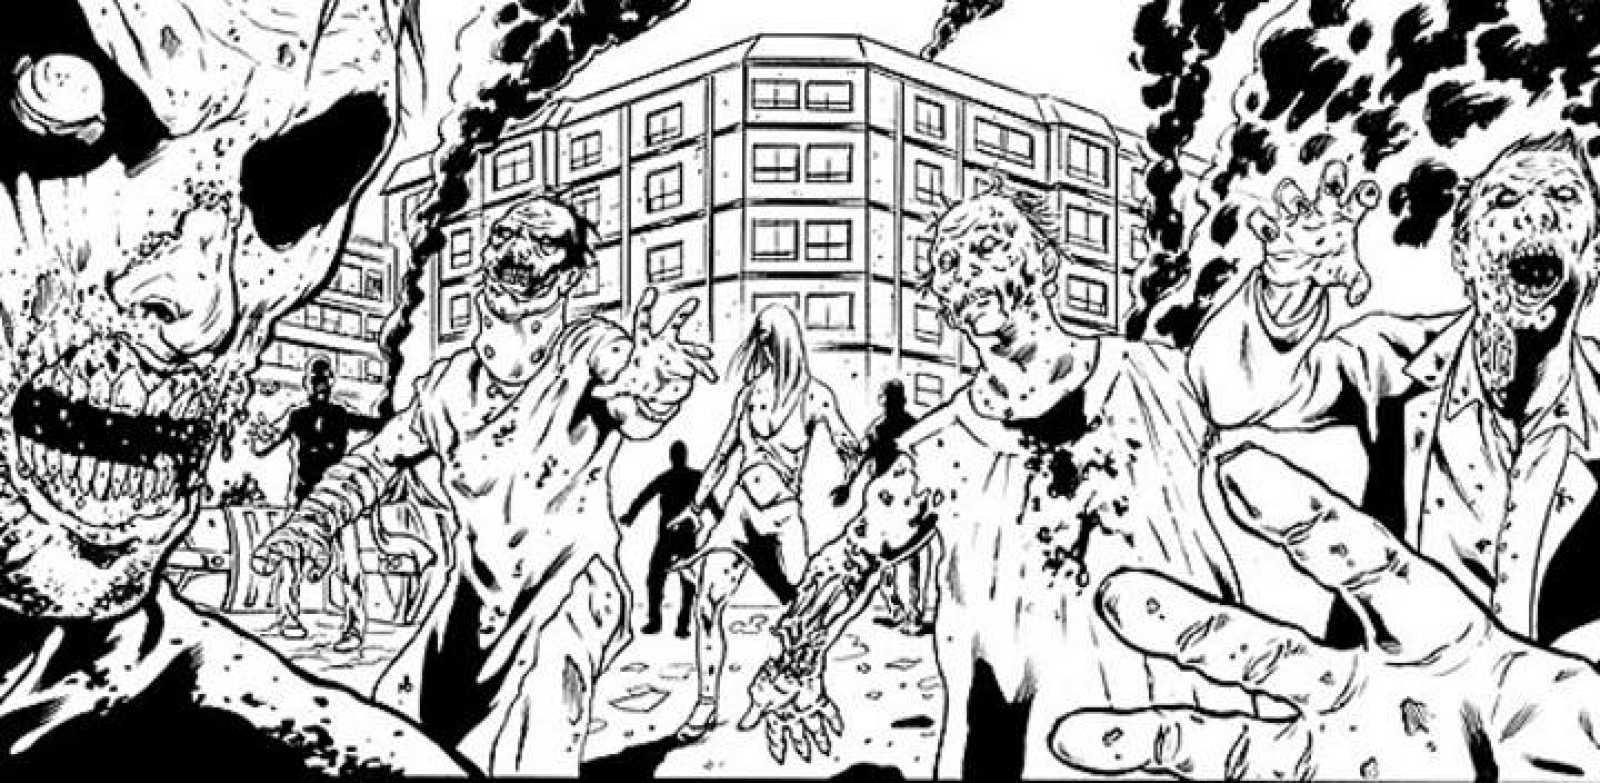 Detalle de una viñeta de 'Apocalipsis Z', de Manel Loureiro y Vicente Vegas